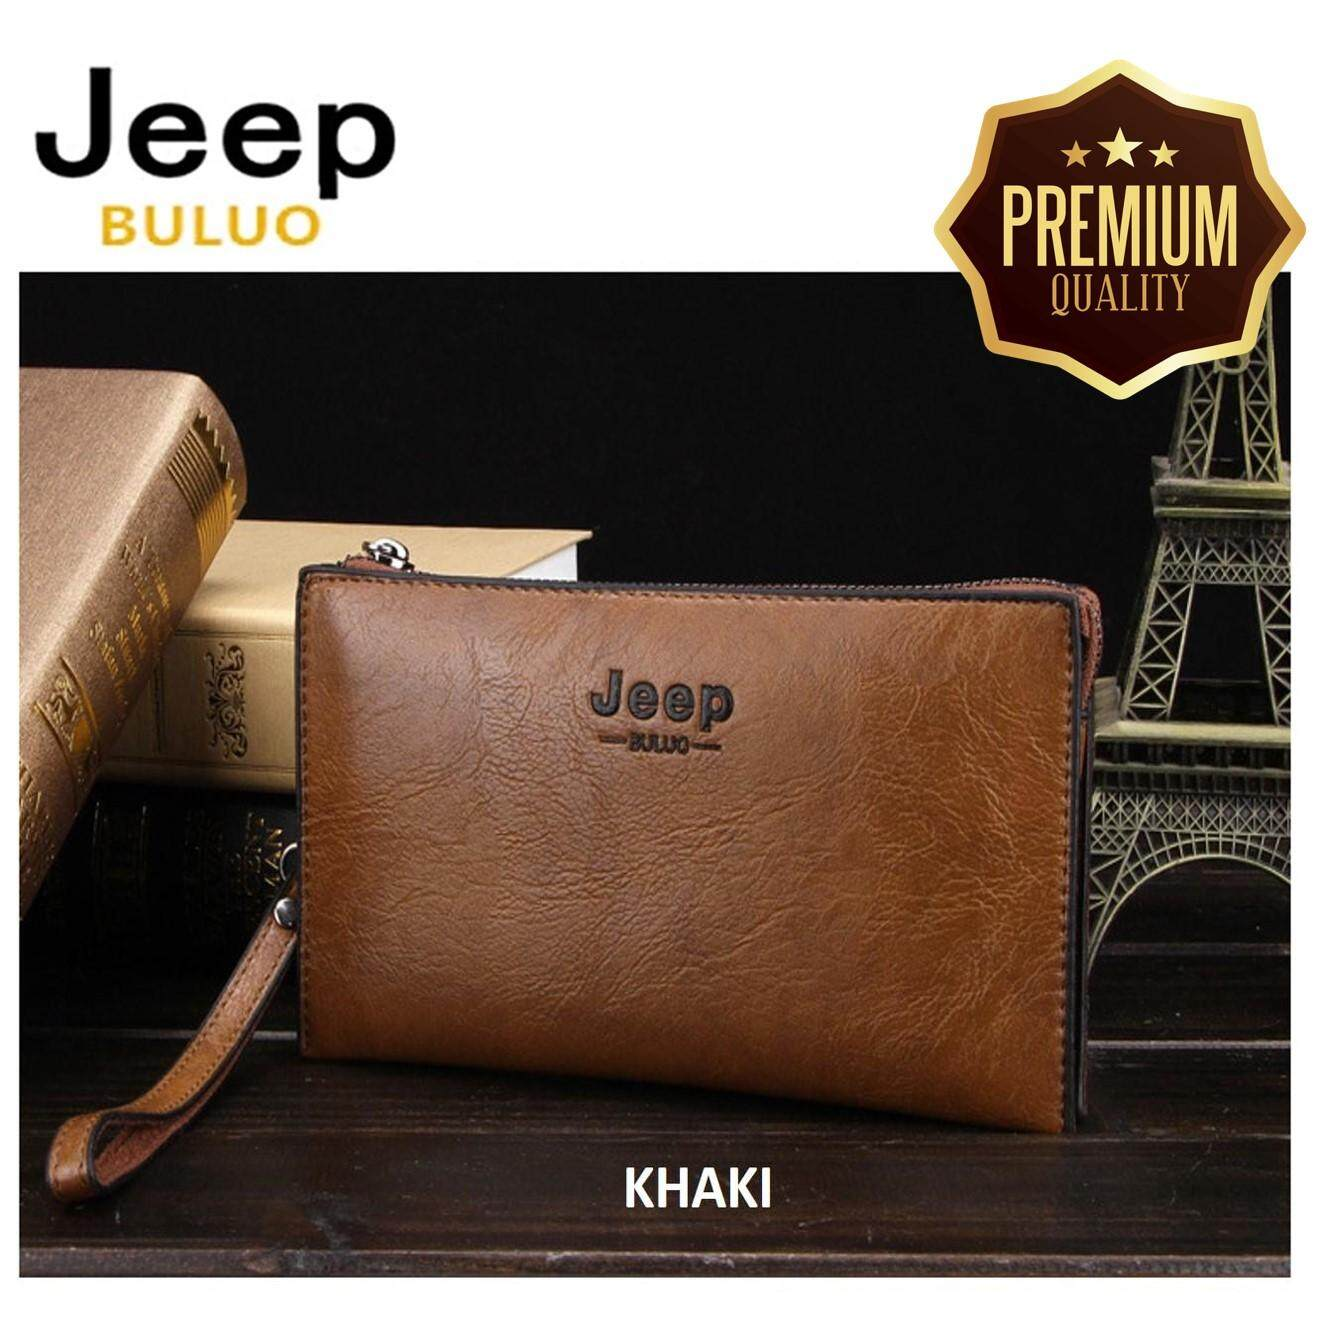 9138fba7f95e  PREMIUM QUALITY  JEEP Professional Men New Fashion Modern Genuine Leather  Hand Bag Wallet